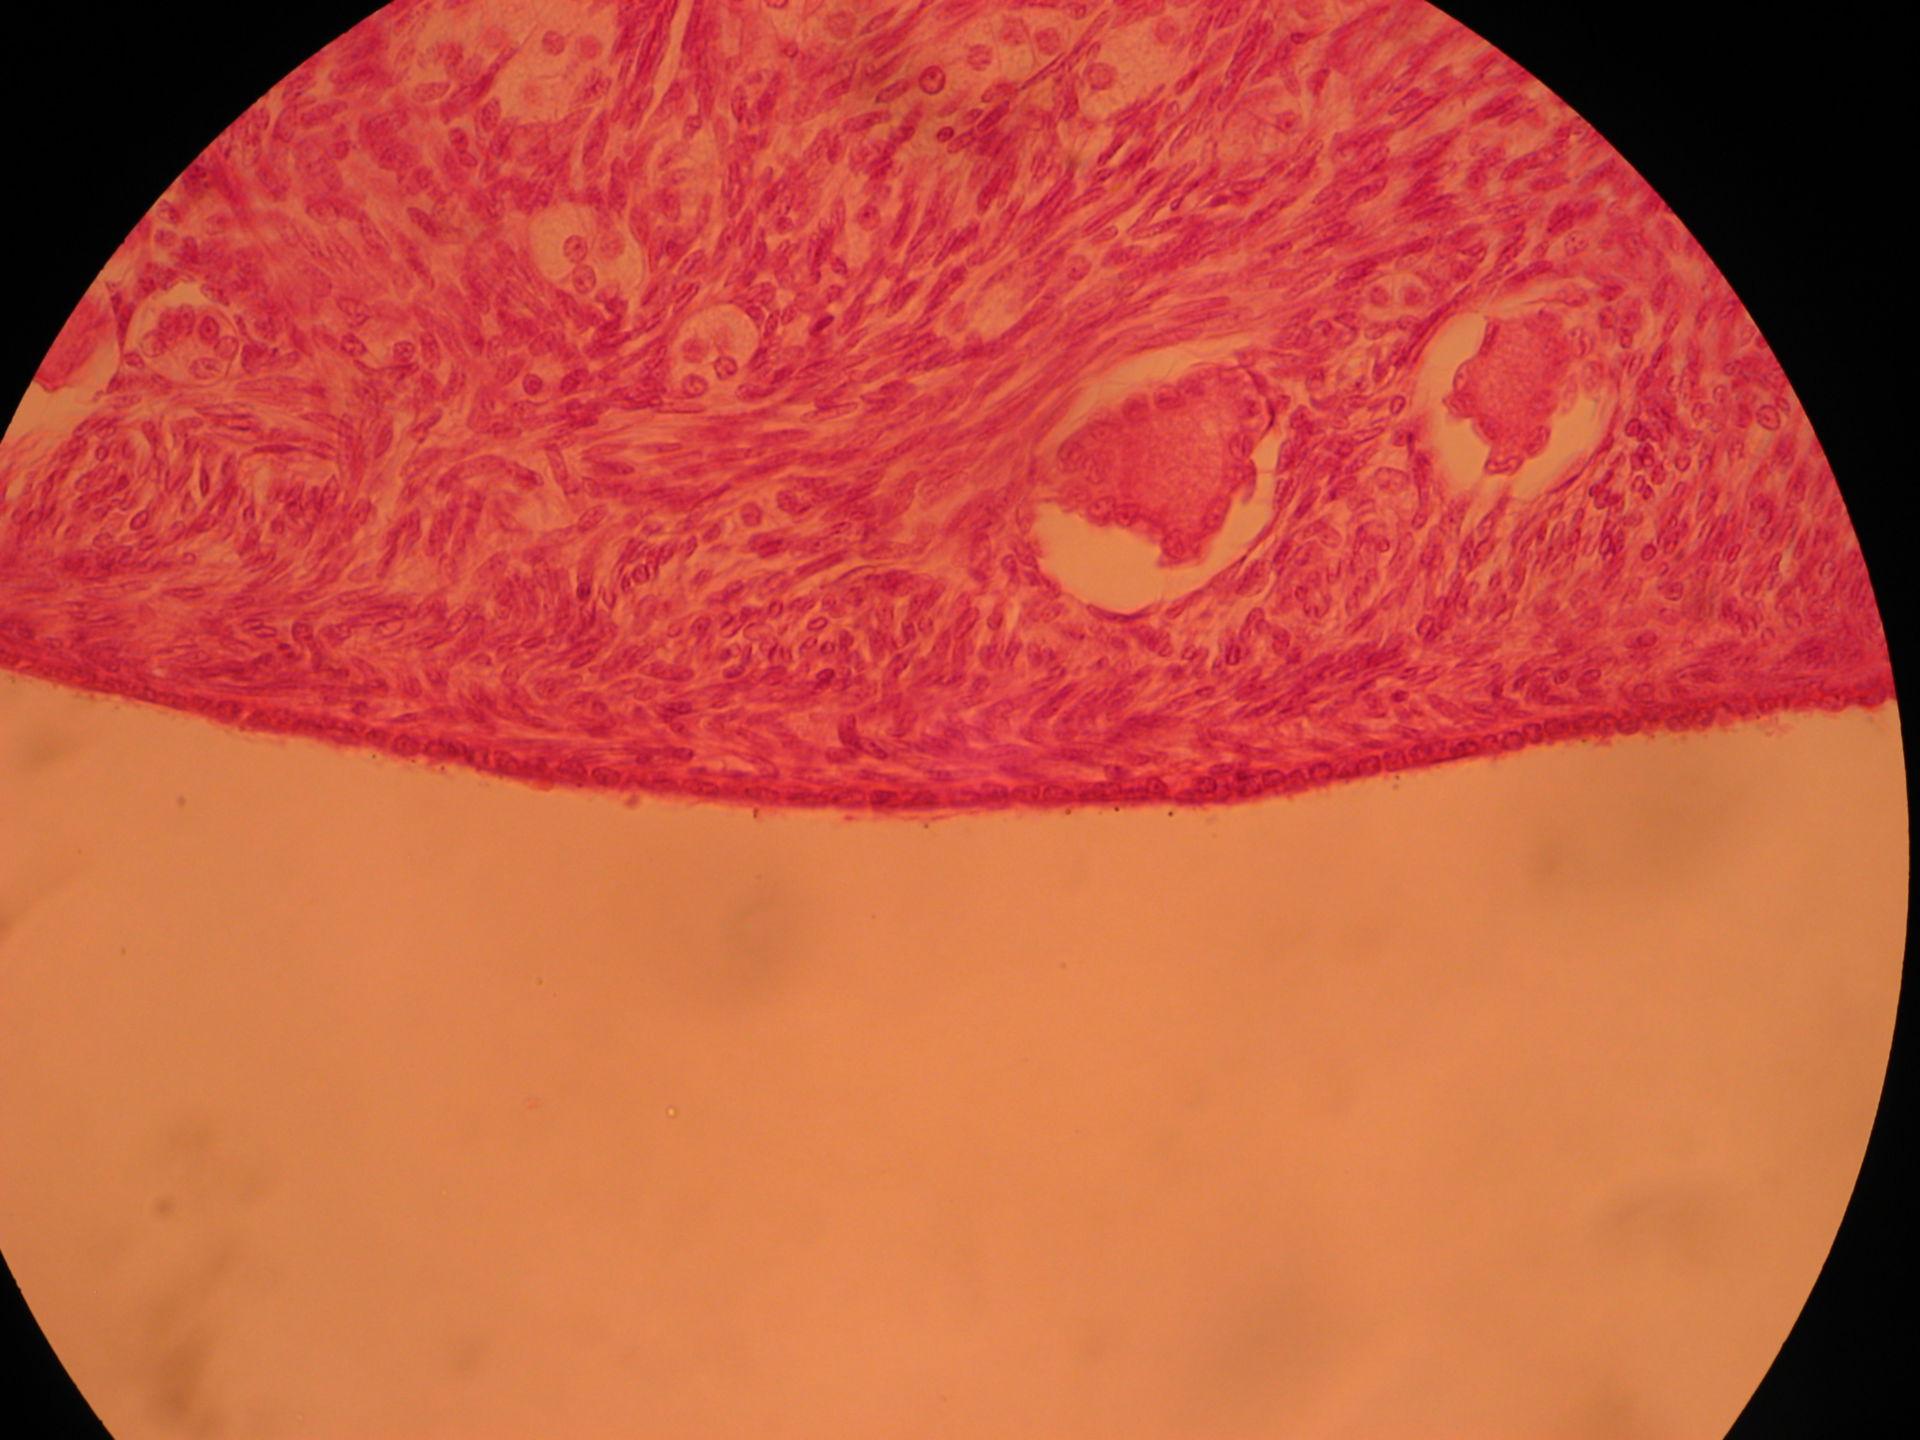 Veterinary Medicine: Ovary of a Cat (6)- Gonadal Epithelium